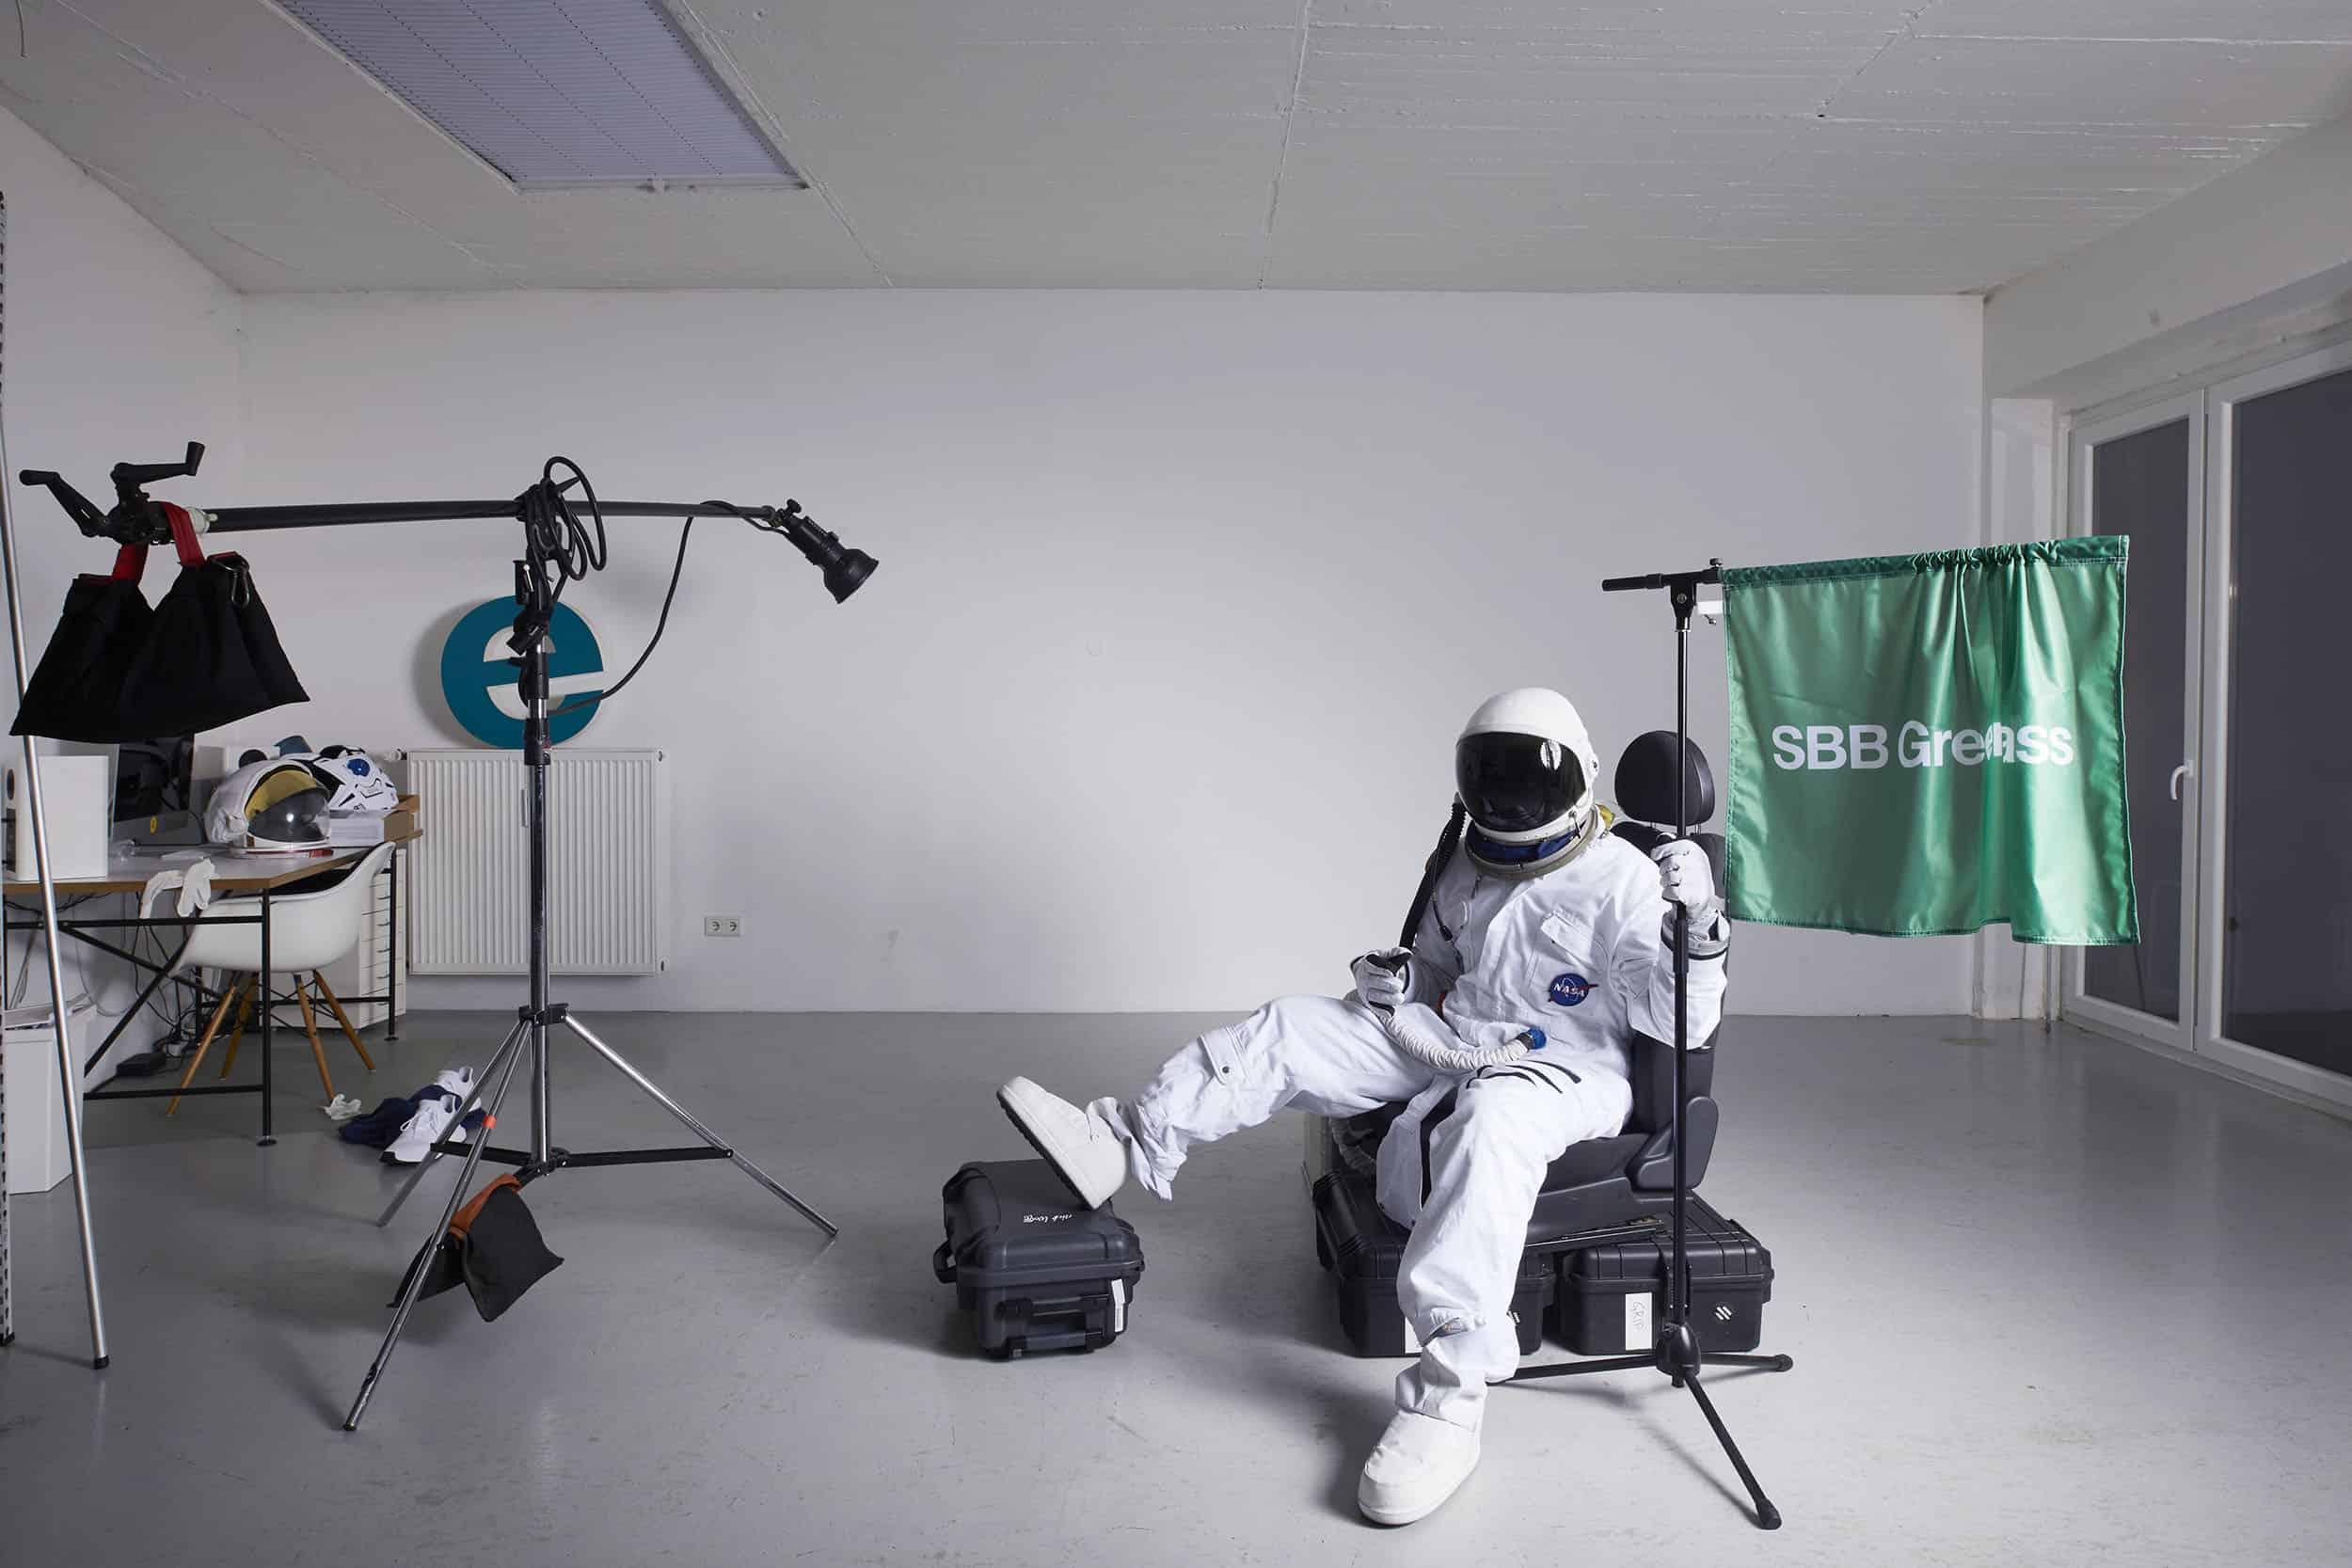 studio-ignatov-sbb-greenclass-ch-imagekampagne-makingof-16